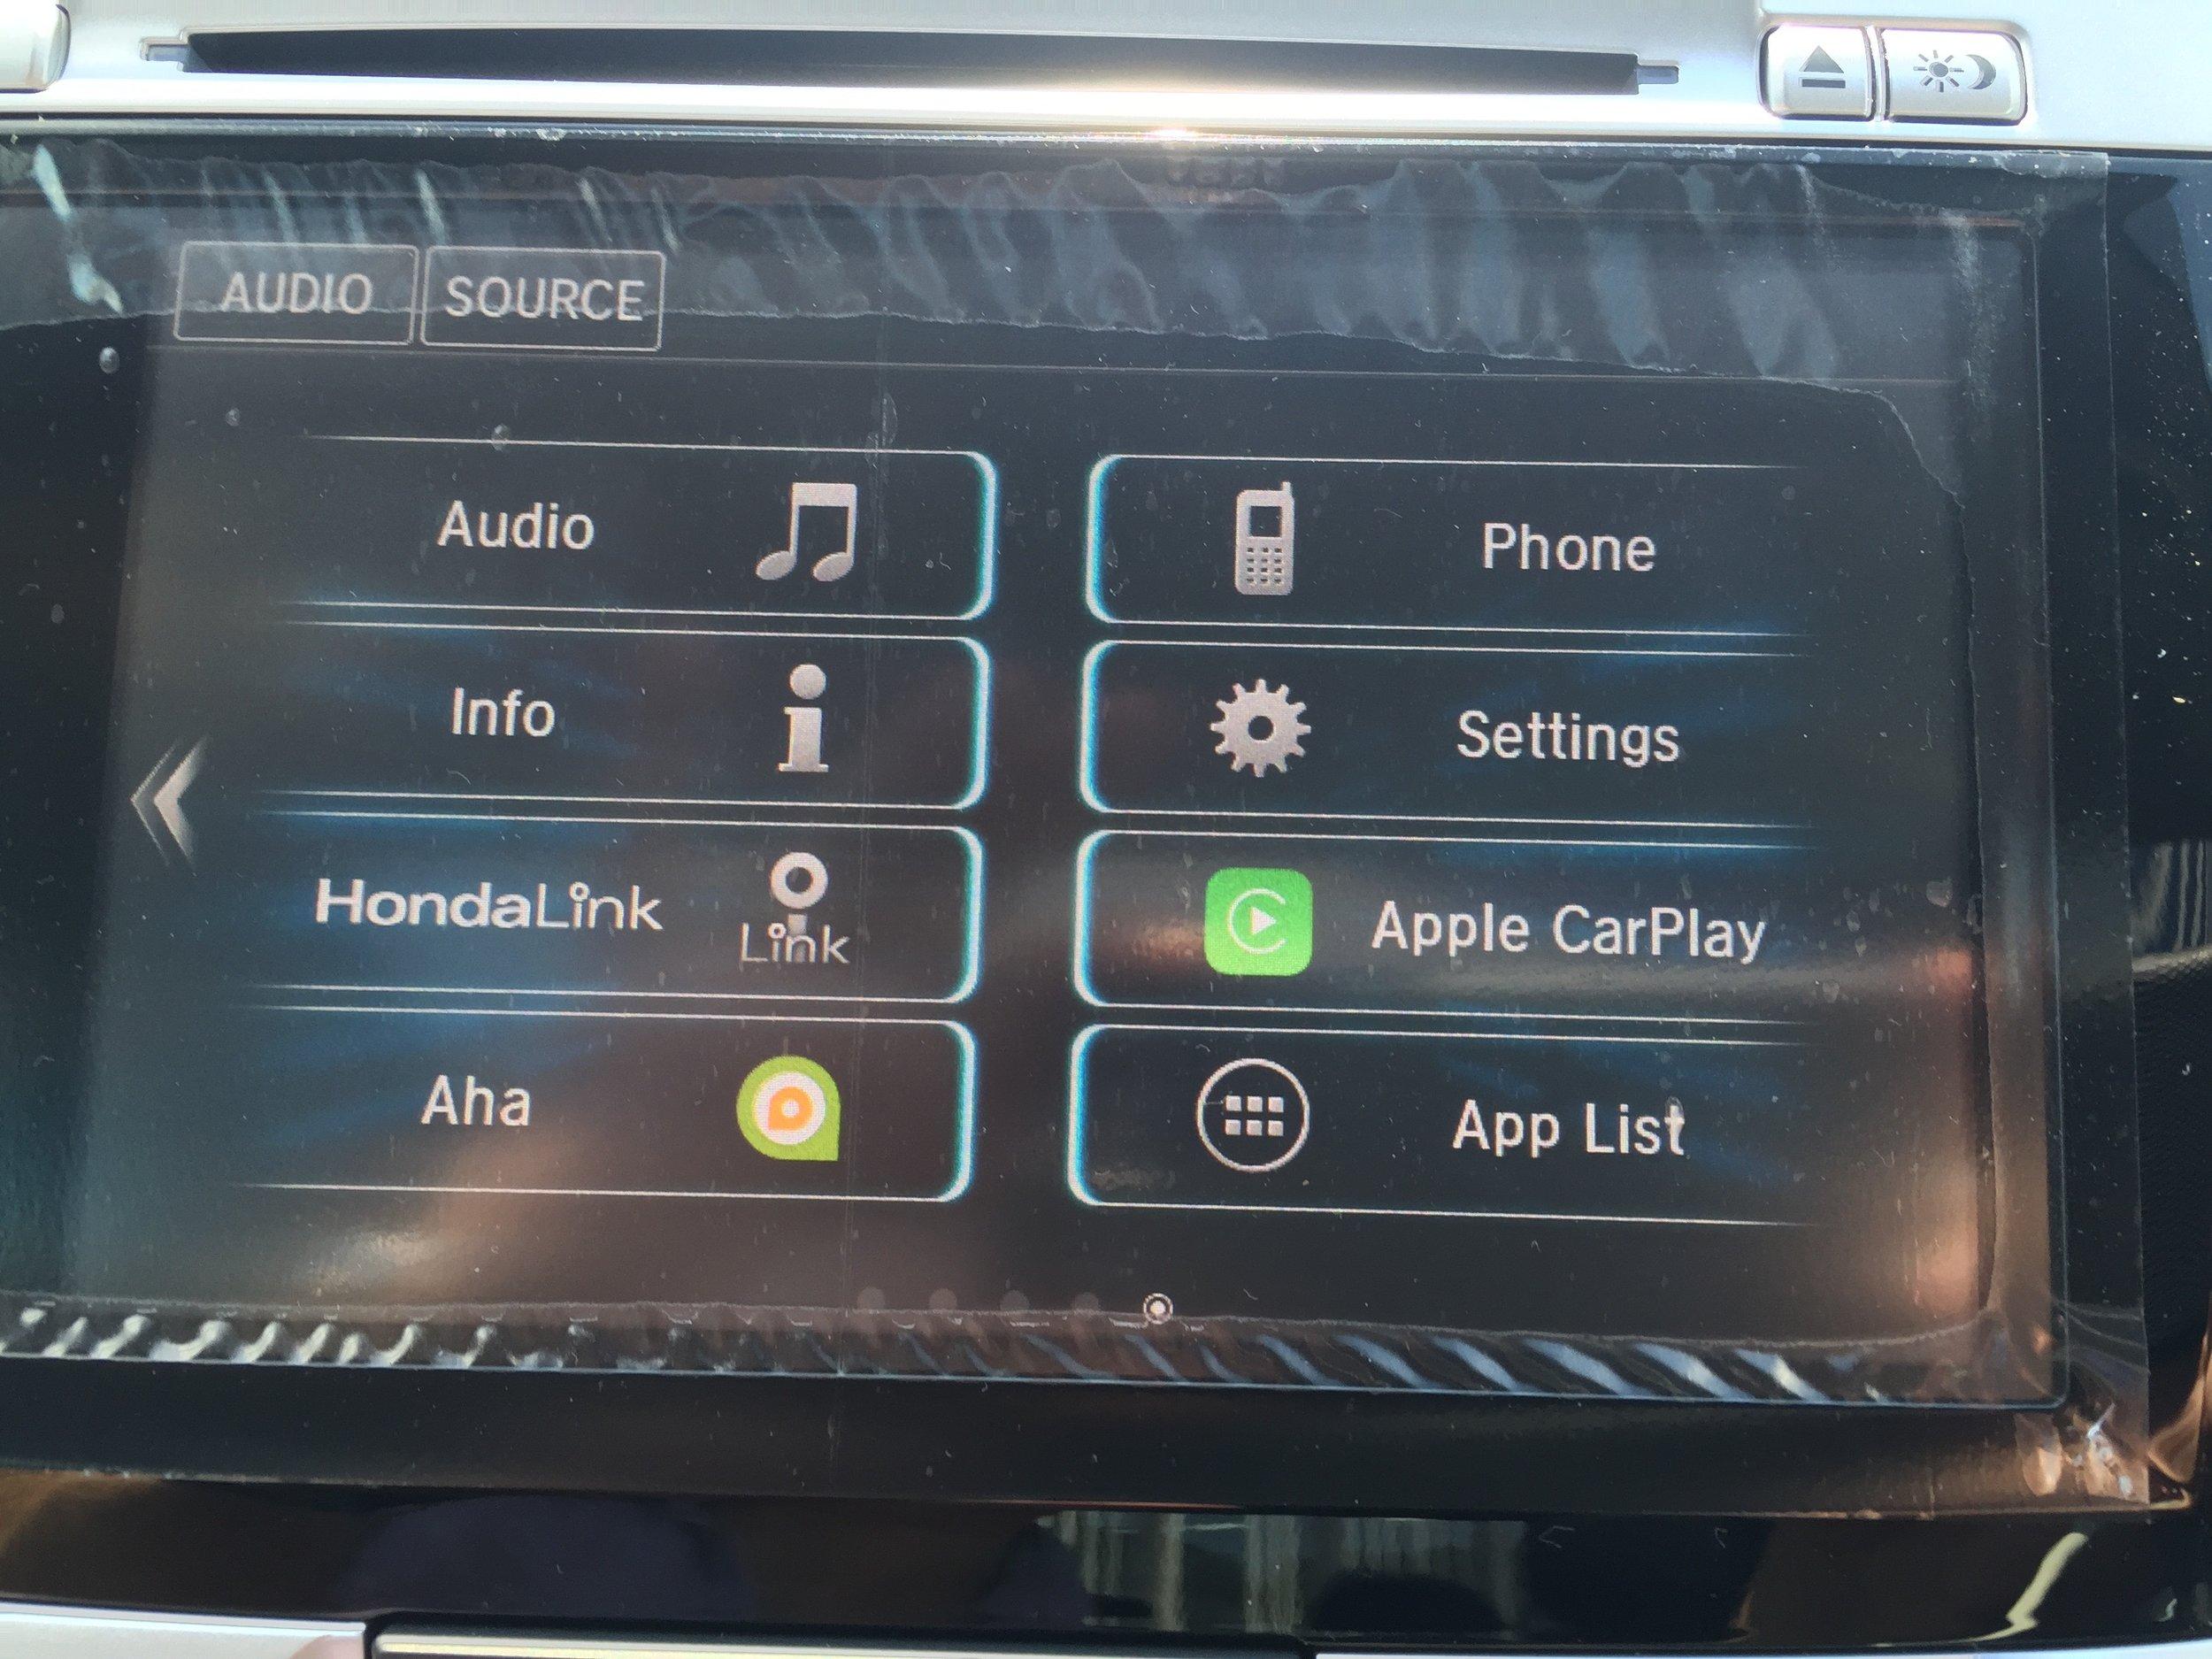 Honda's Car UI - Where are the AM/FM buttons?